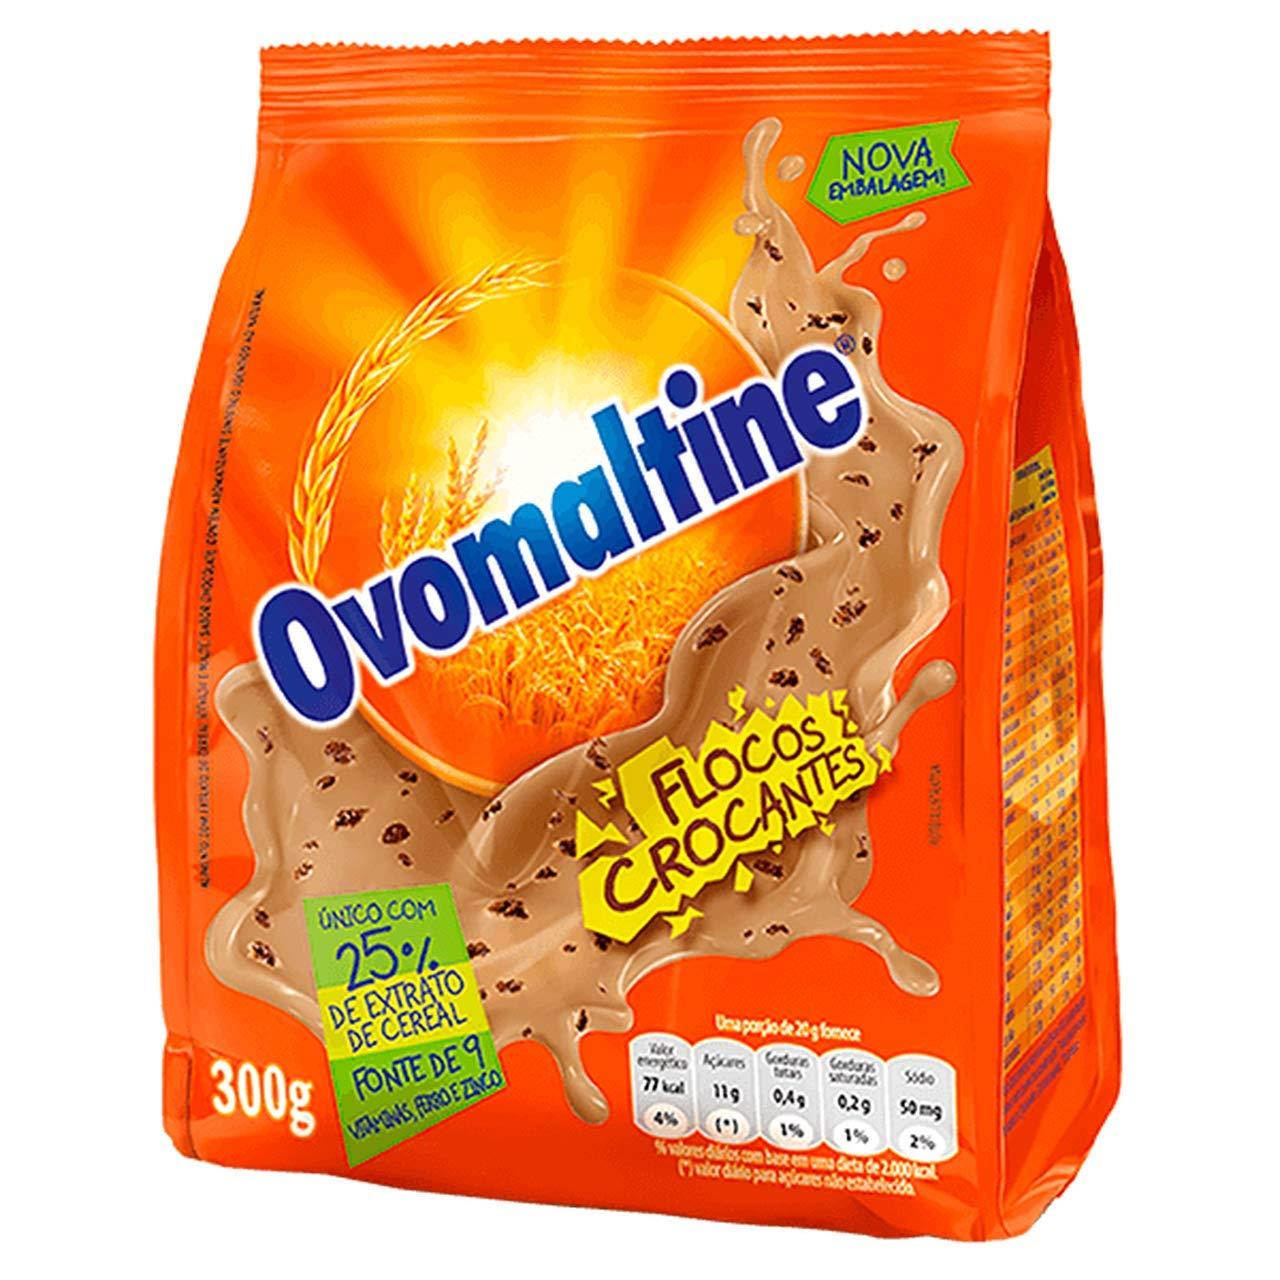 Ovomaltine Crunchy Chocolate Powder 10.58 oz   Ovomaltine Chocolate em Flocos 300g